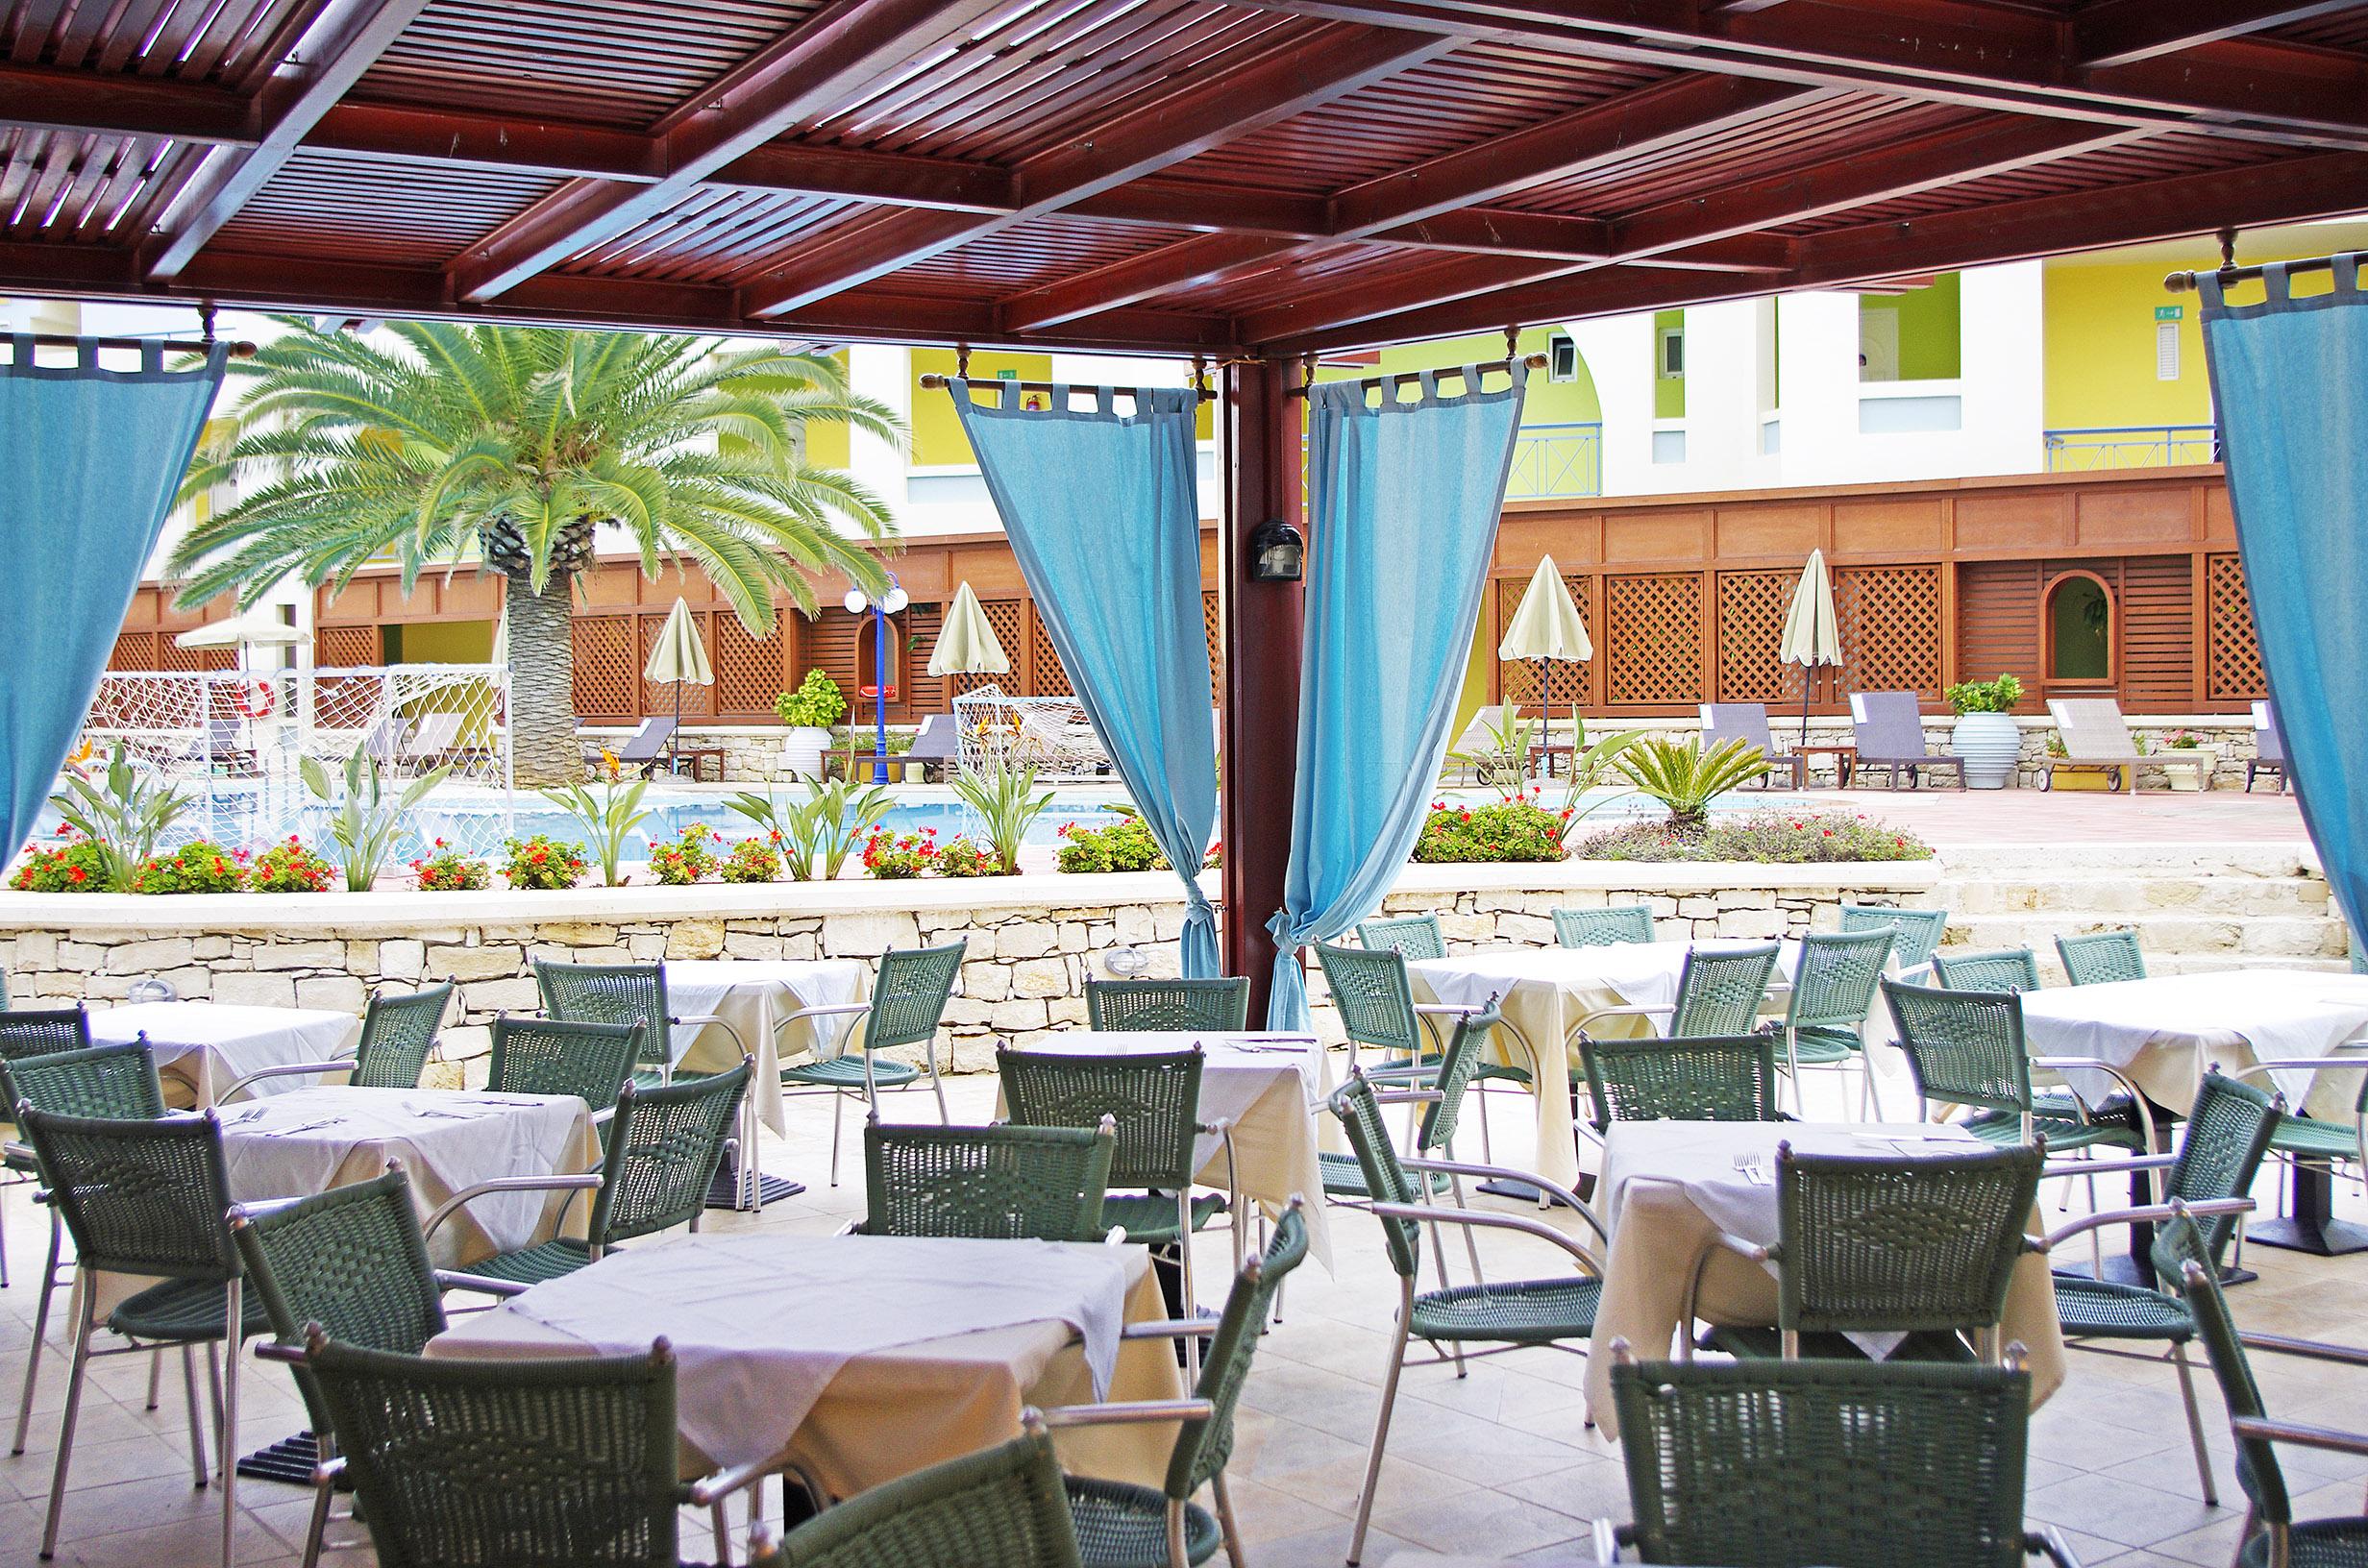 Kafenion at Mythos Palace Resort & Spa in Georgioupolis